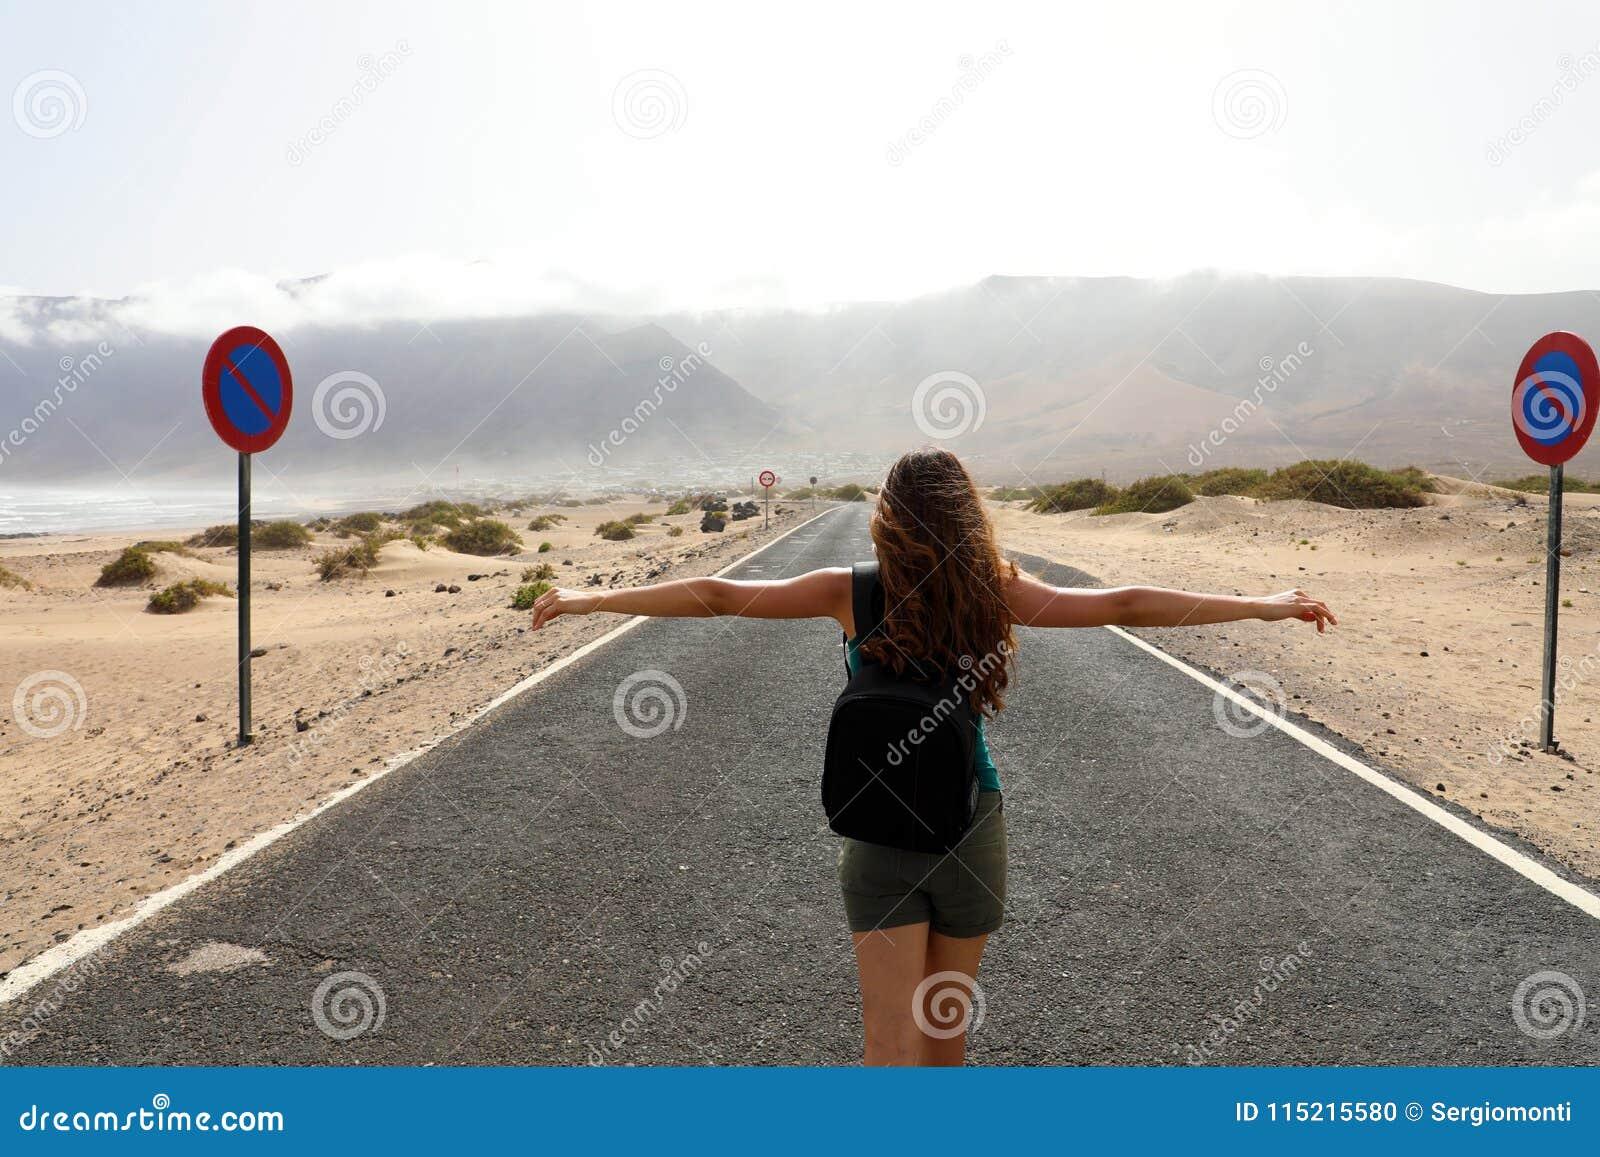 Female carefree backpacker enjoying the landscape in the middle of the desert asphalt road.